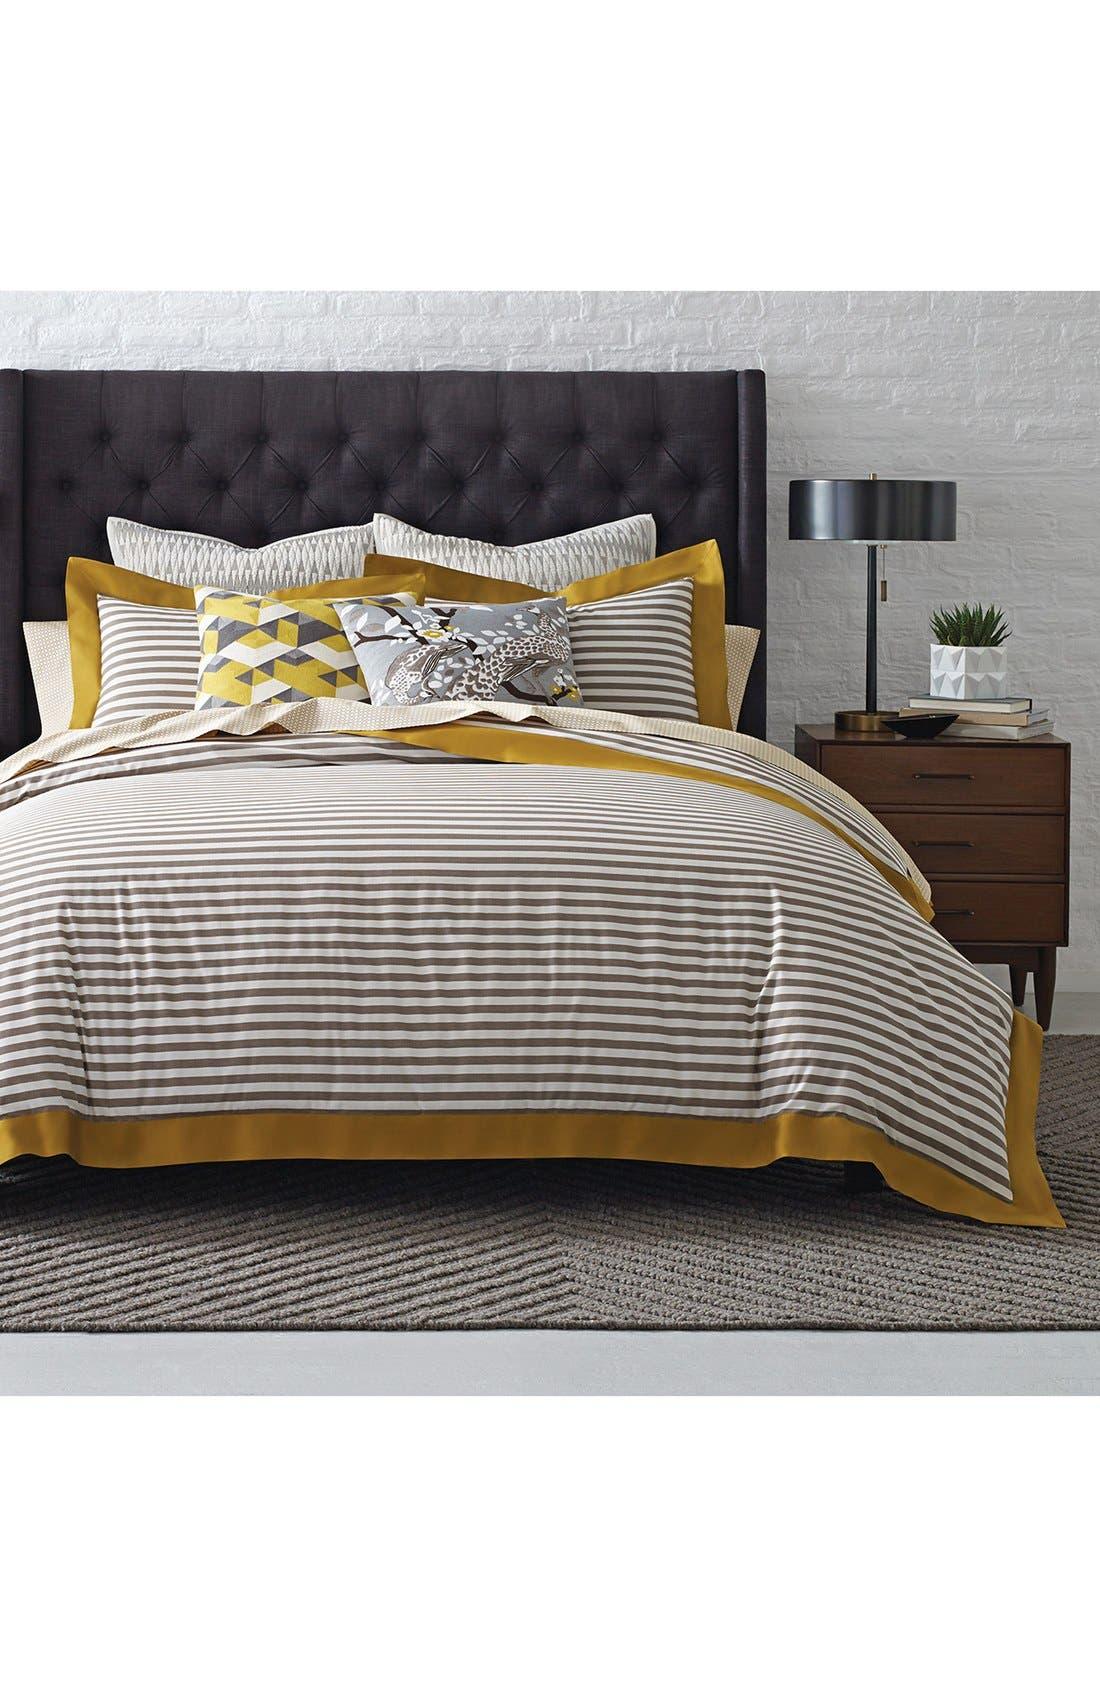 'Draper Stripe' Duvet Cover,                         Main,                         color, 700